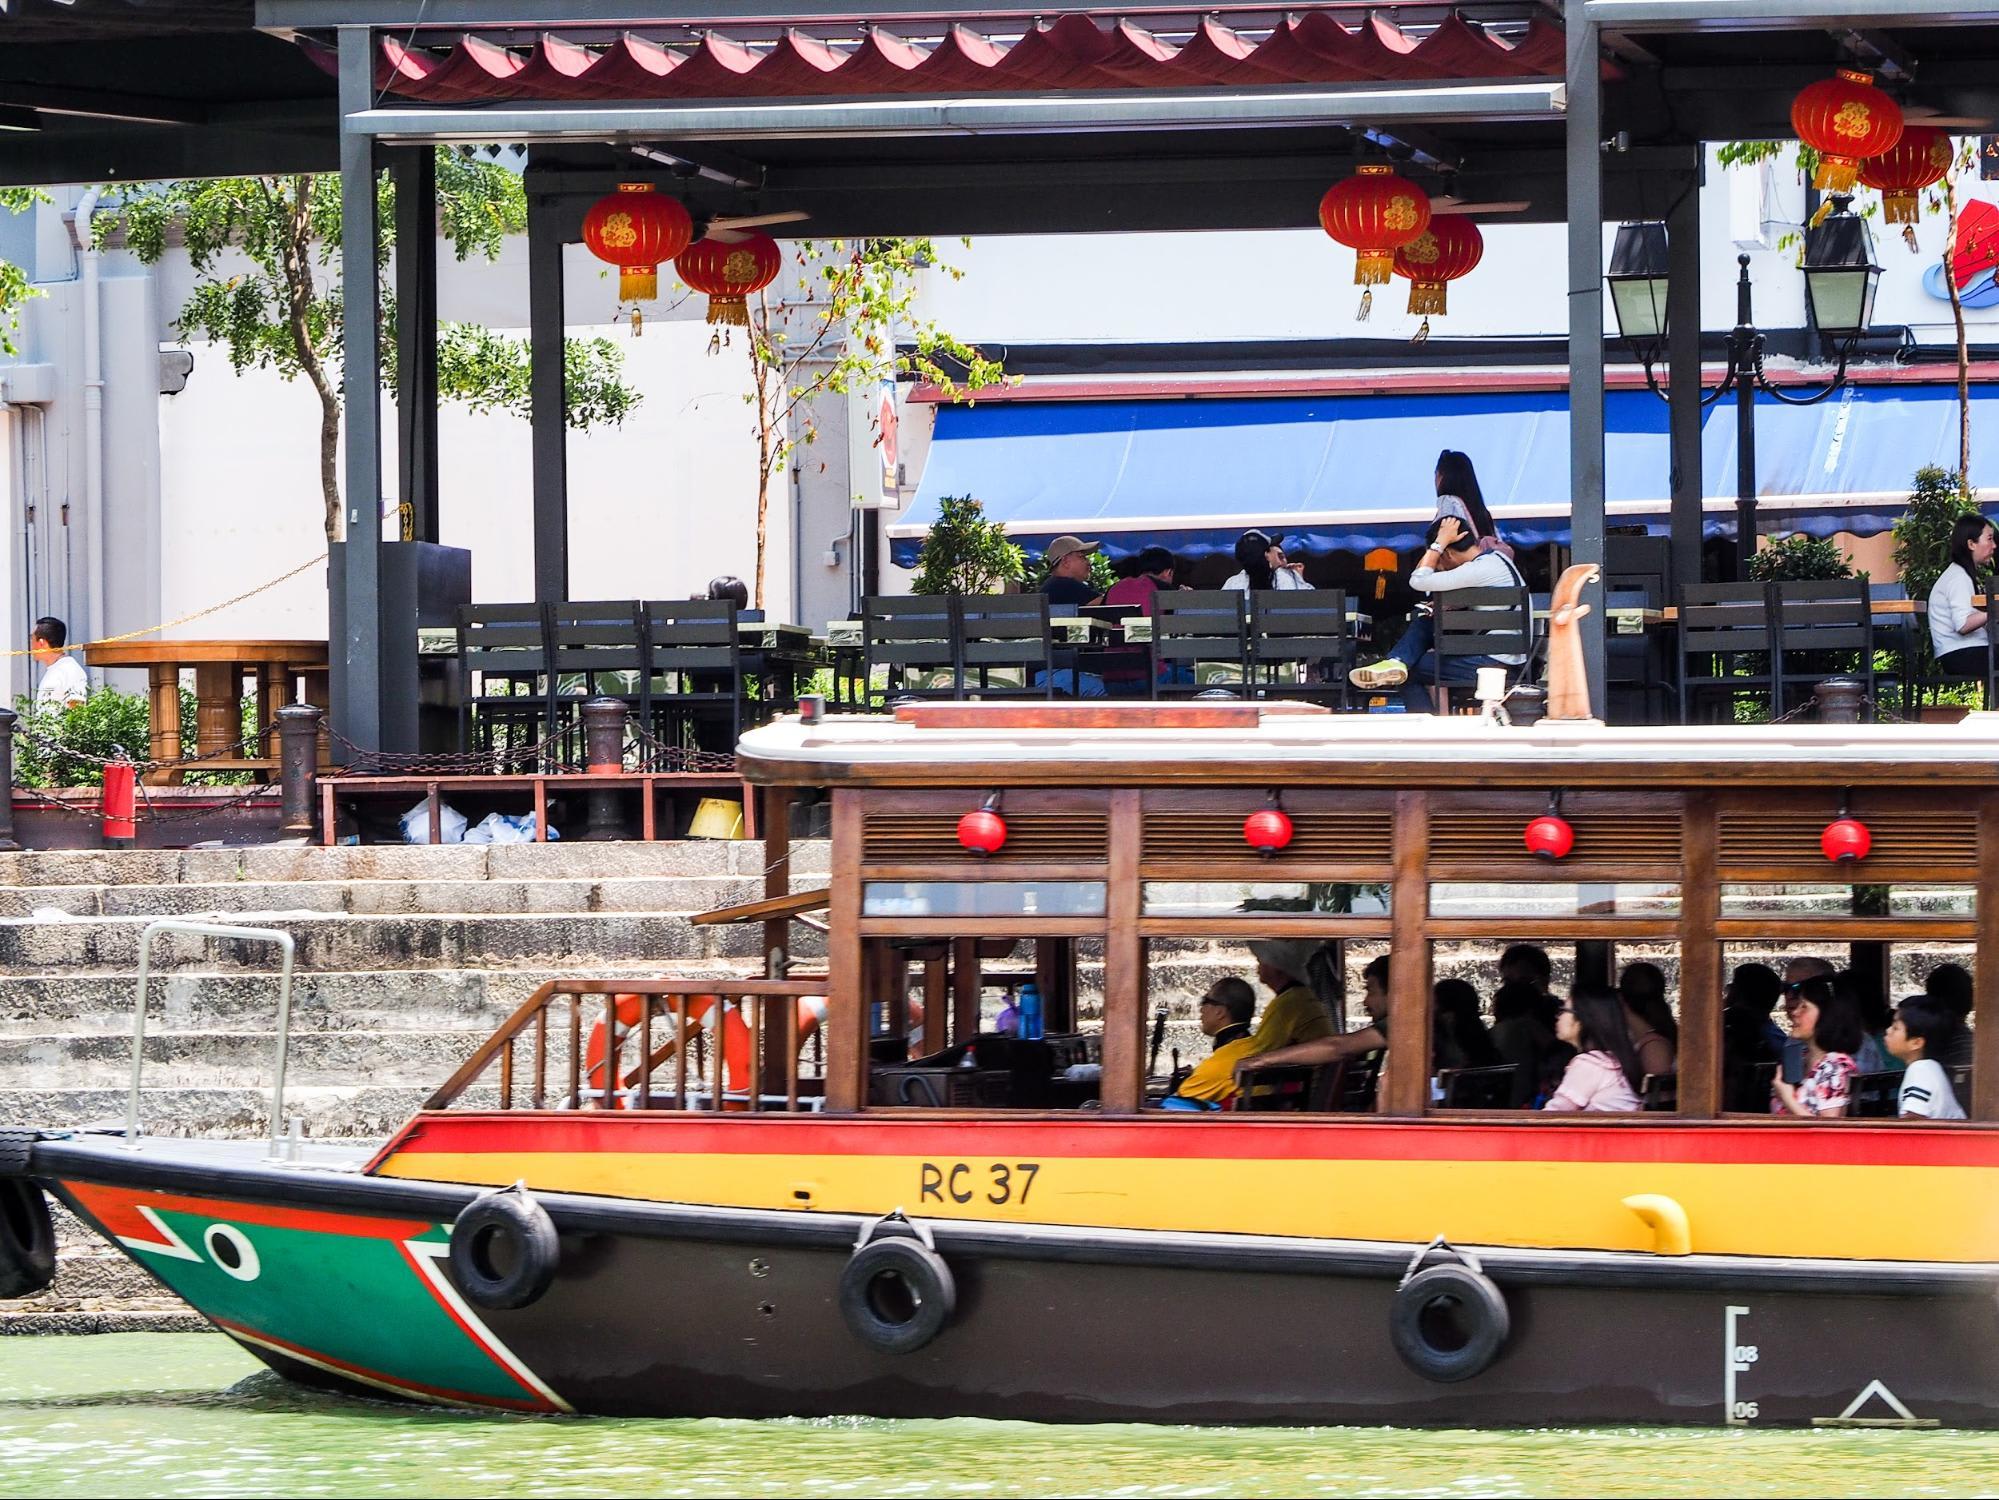 marina bay sands singapore 11 noi nhat dinh phai den3